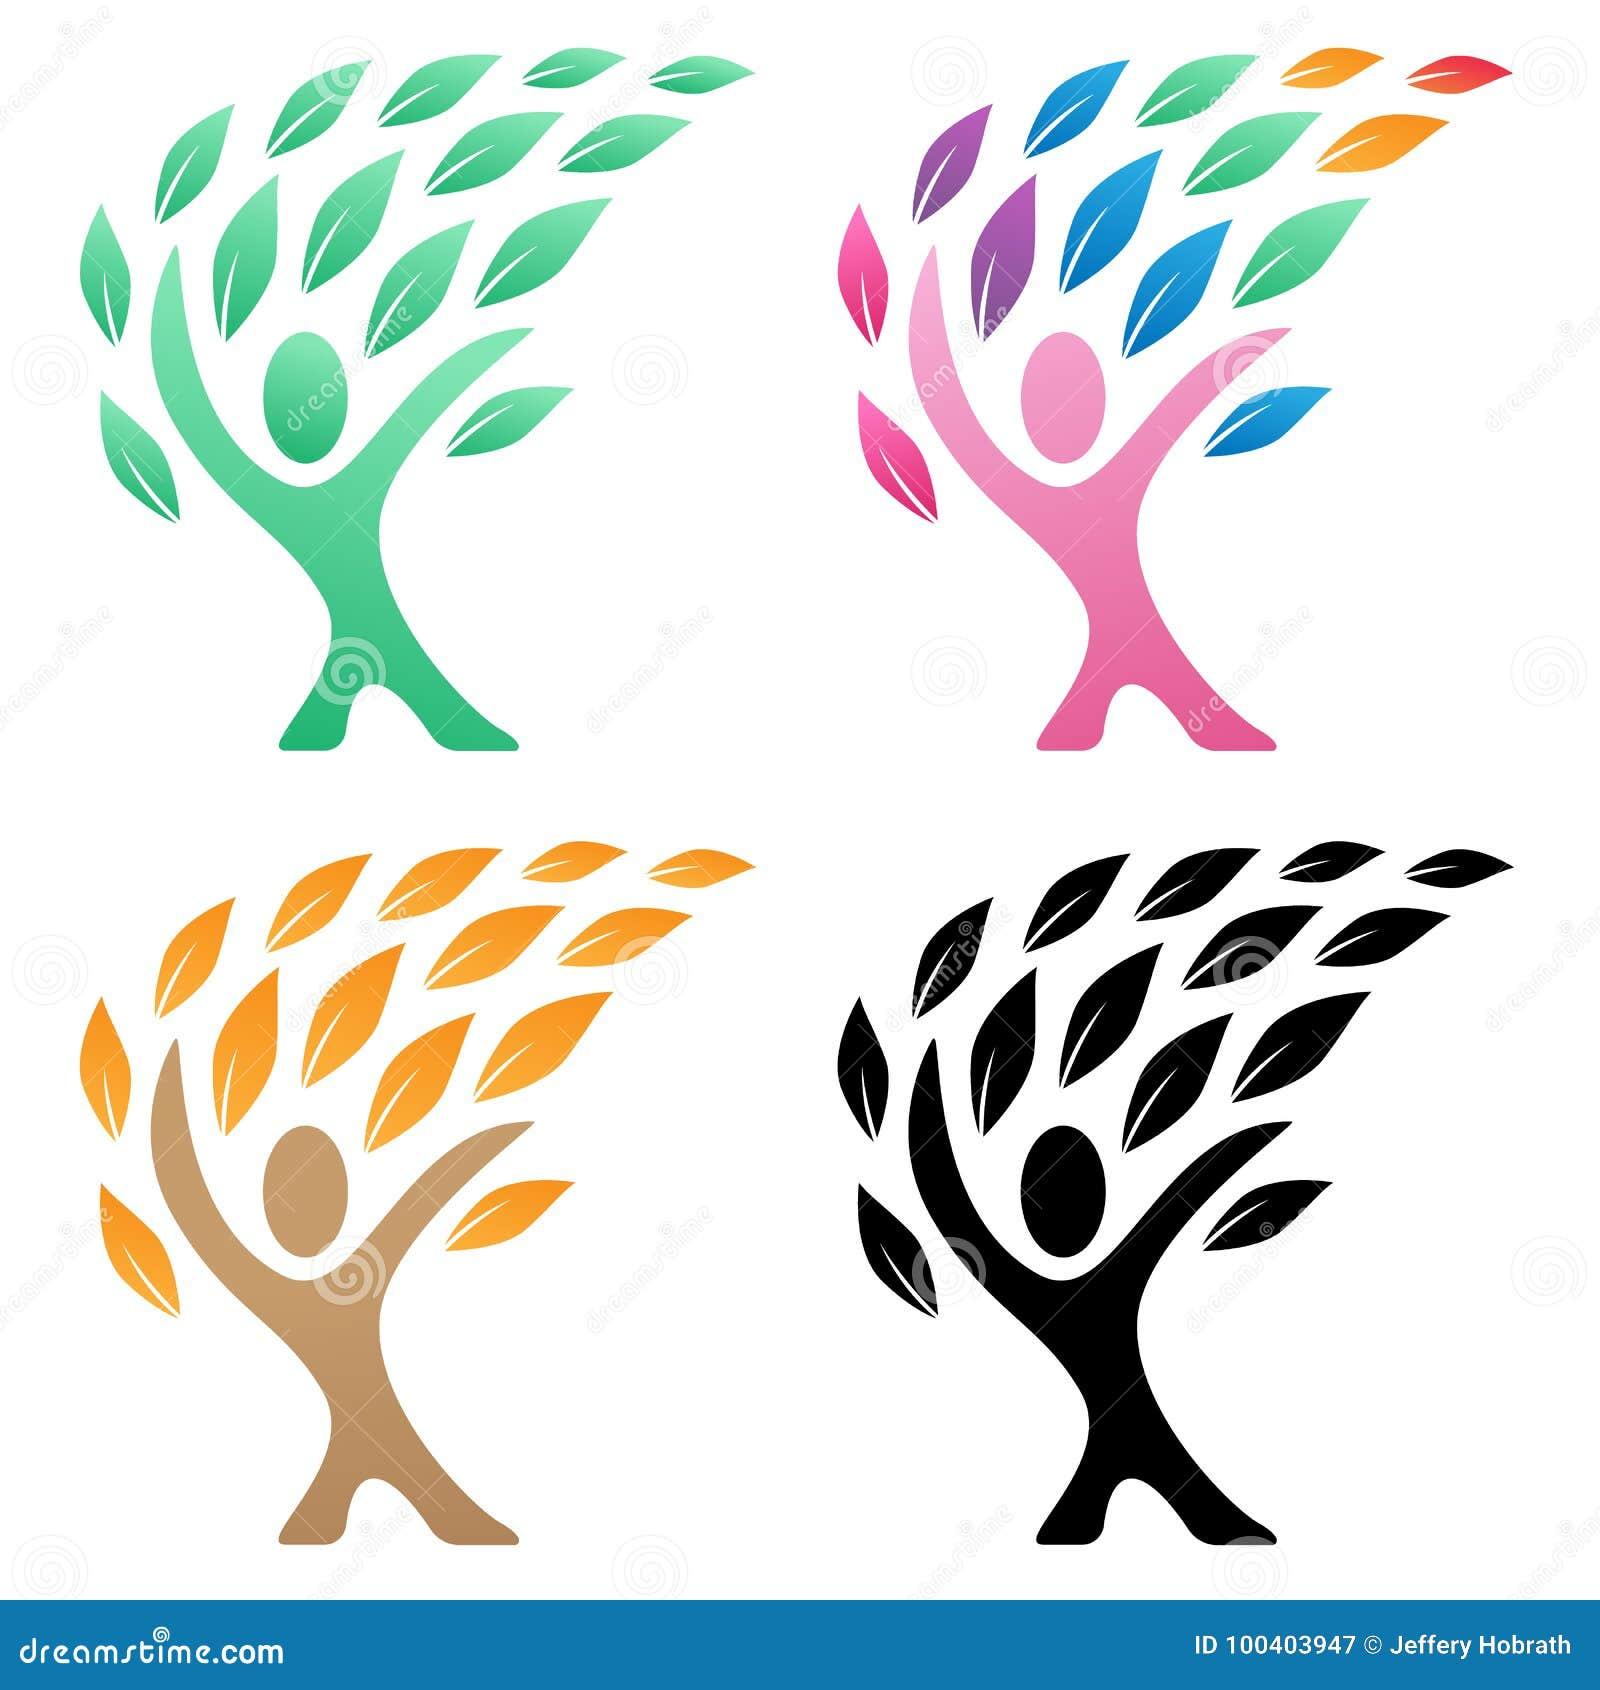 Person life tree logo vector illustration group stock for Illustration minimaliste